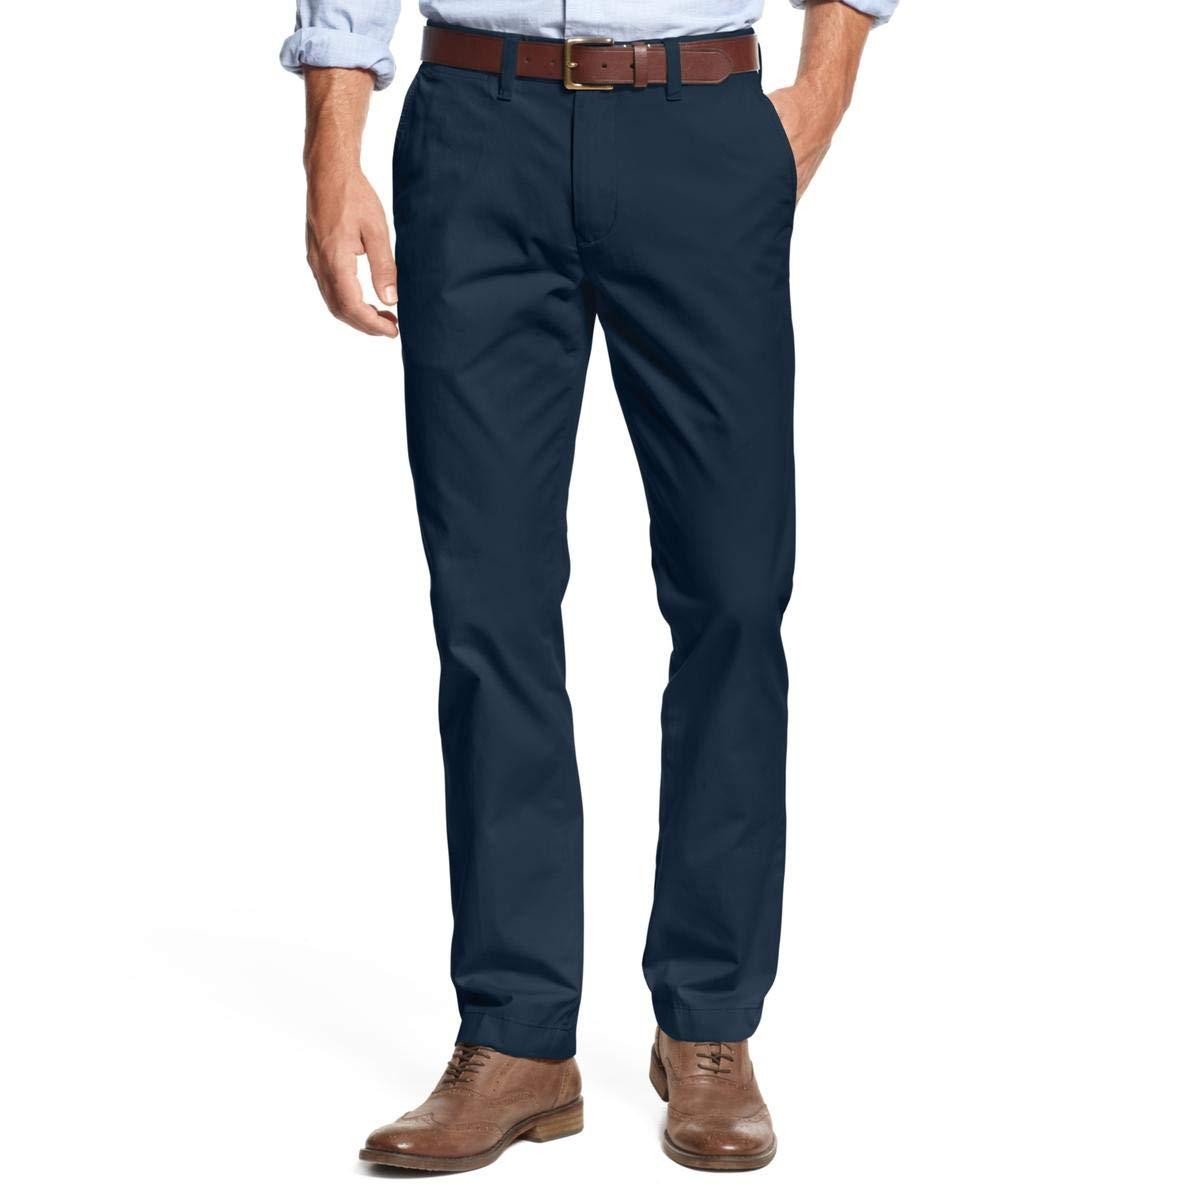 Tommy Hilfiger Men's Big and Tall Classic Fit Chino Pant, Navy Blazer, 40W x 38L